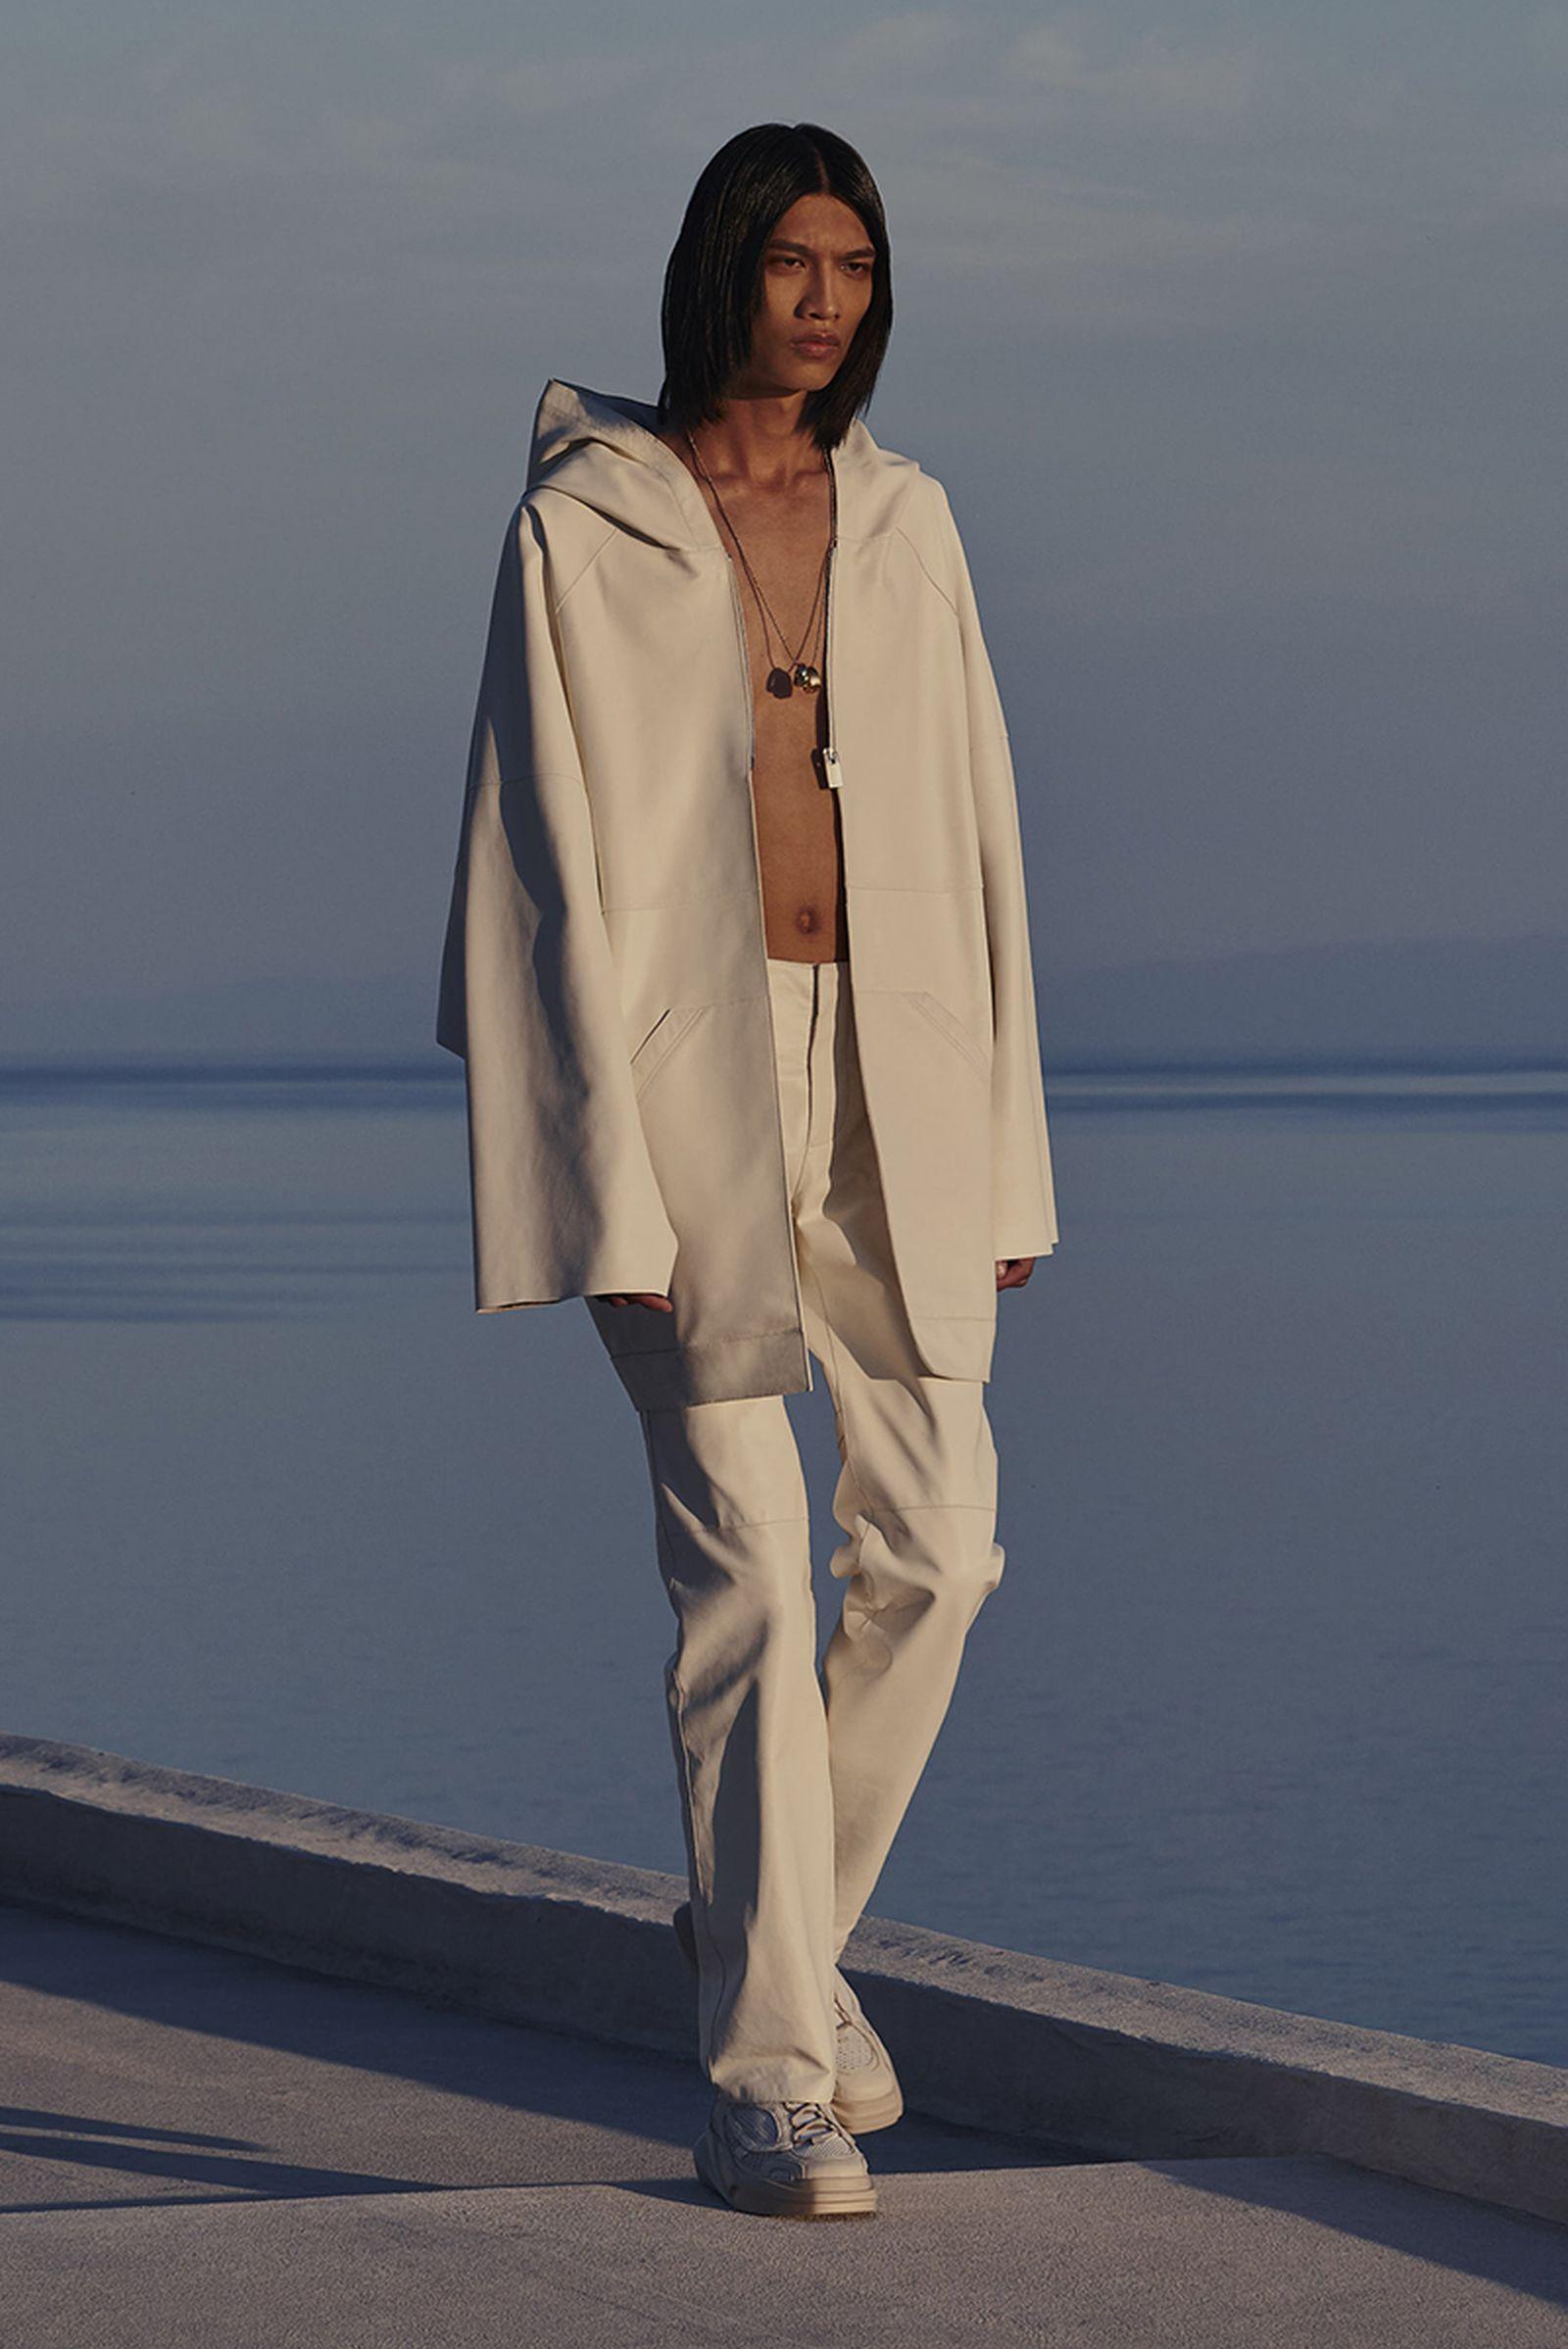 1017-alyx-9sm-spring summer 2022 menswear collection (5)